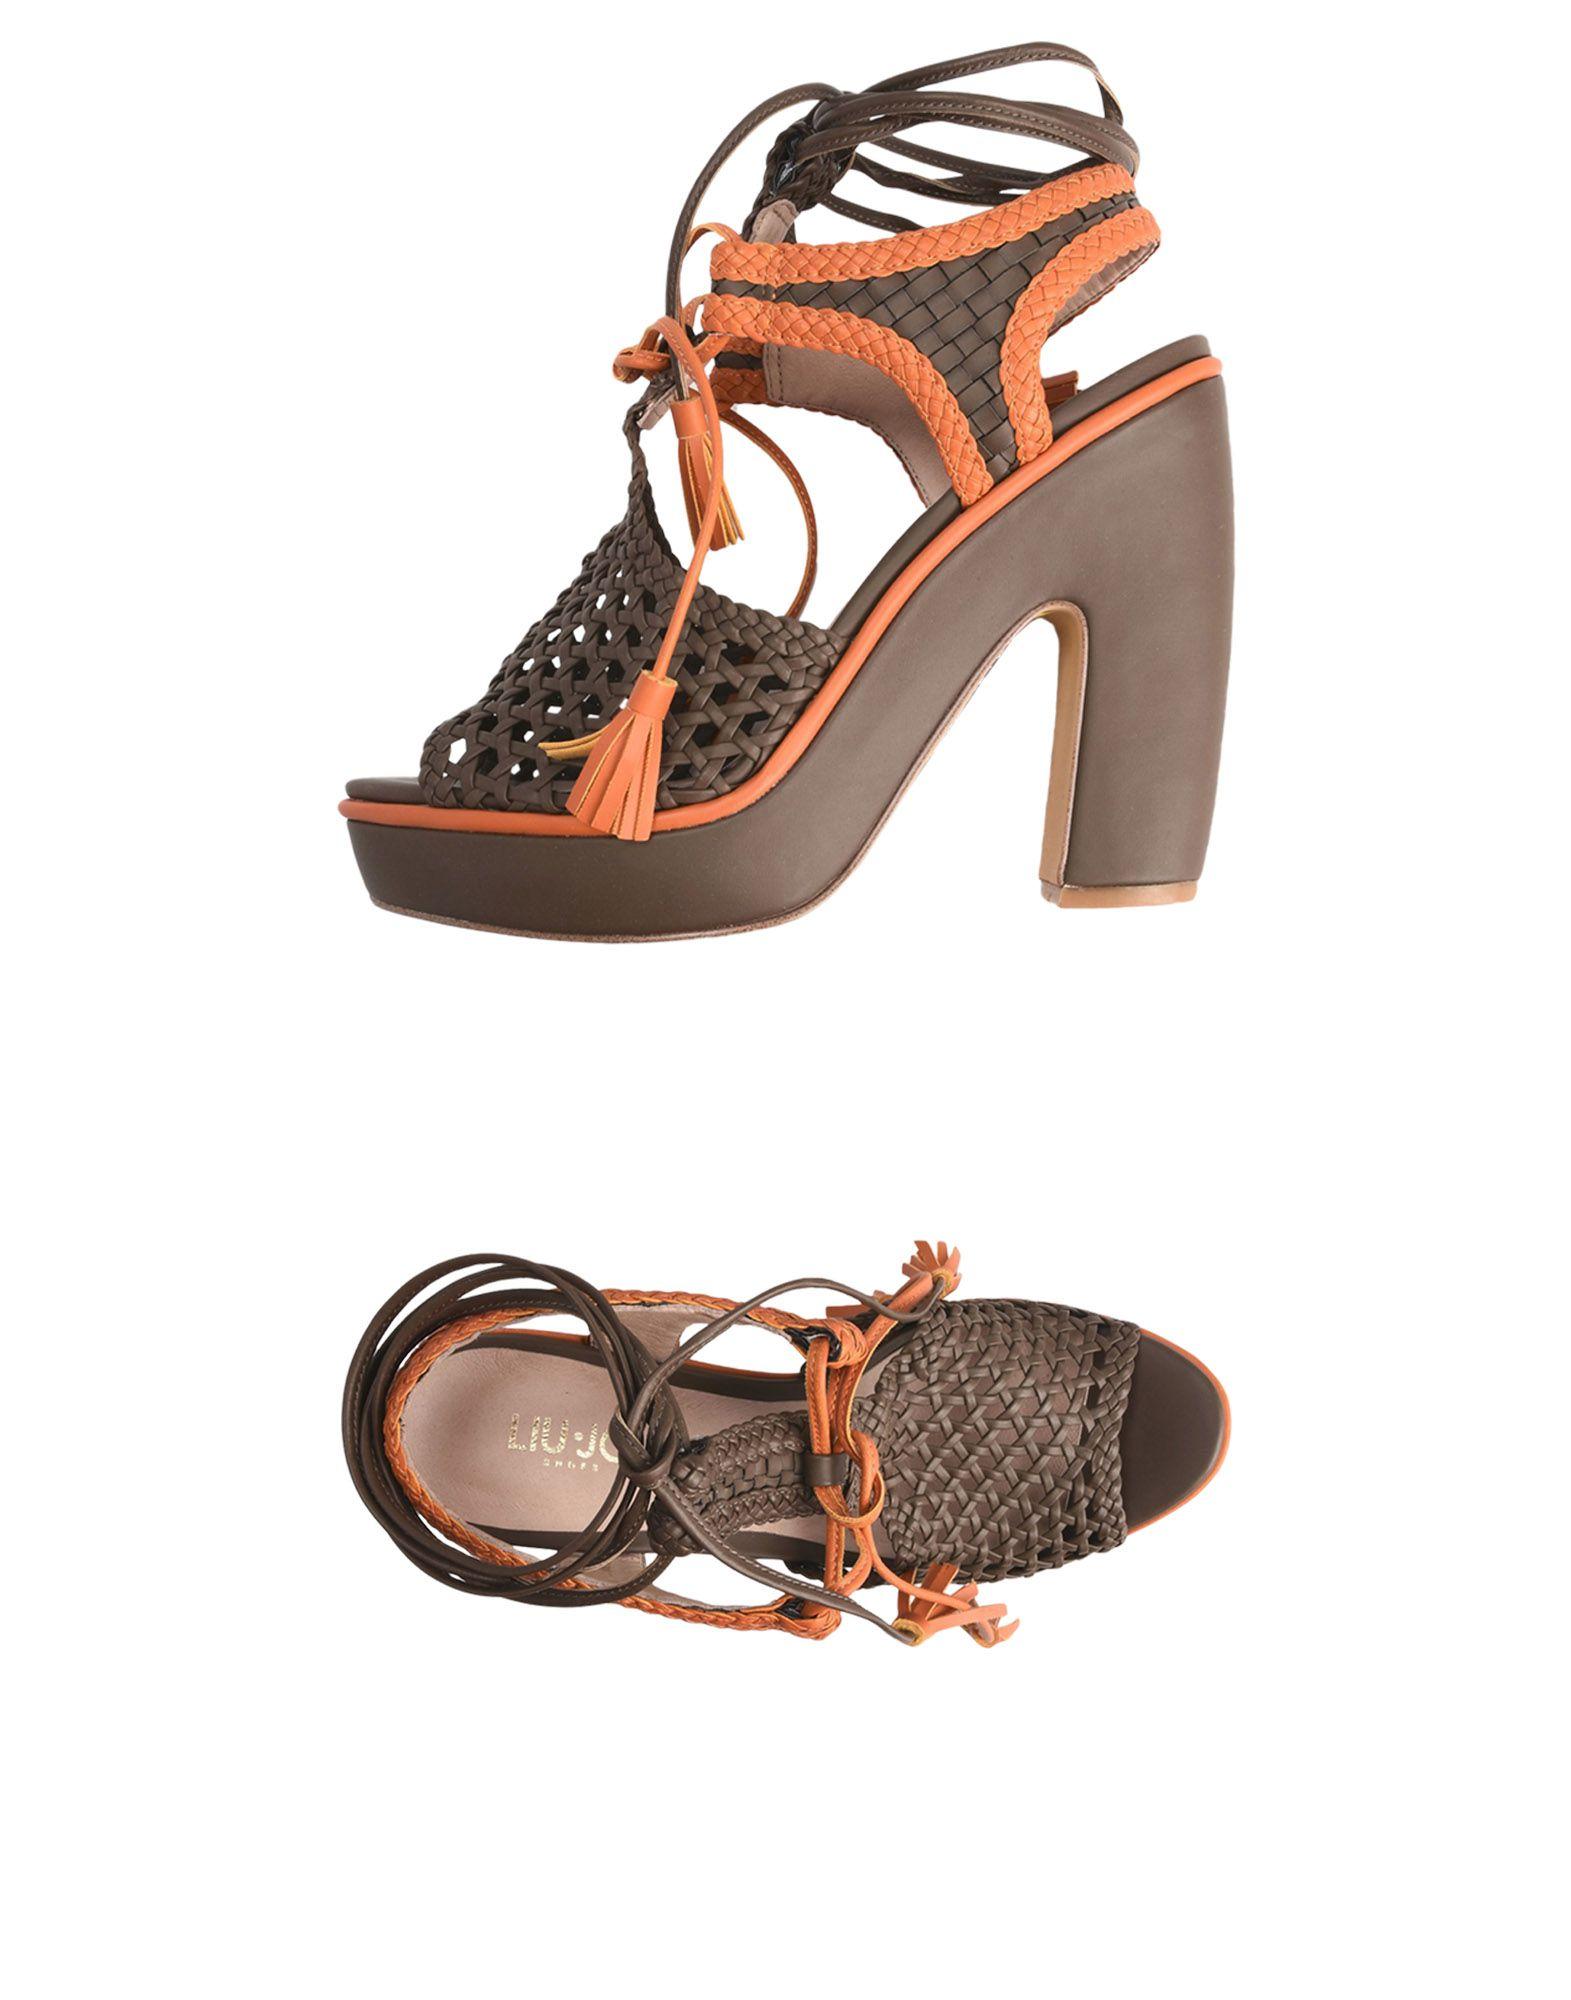 LIU •JO SHOES Сандалии shoes and more сандалии